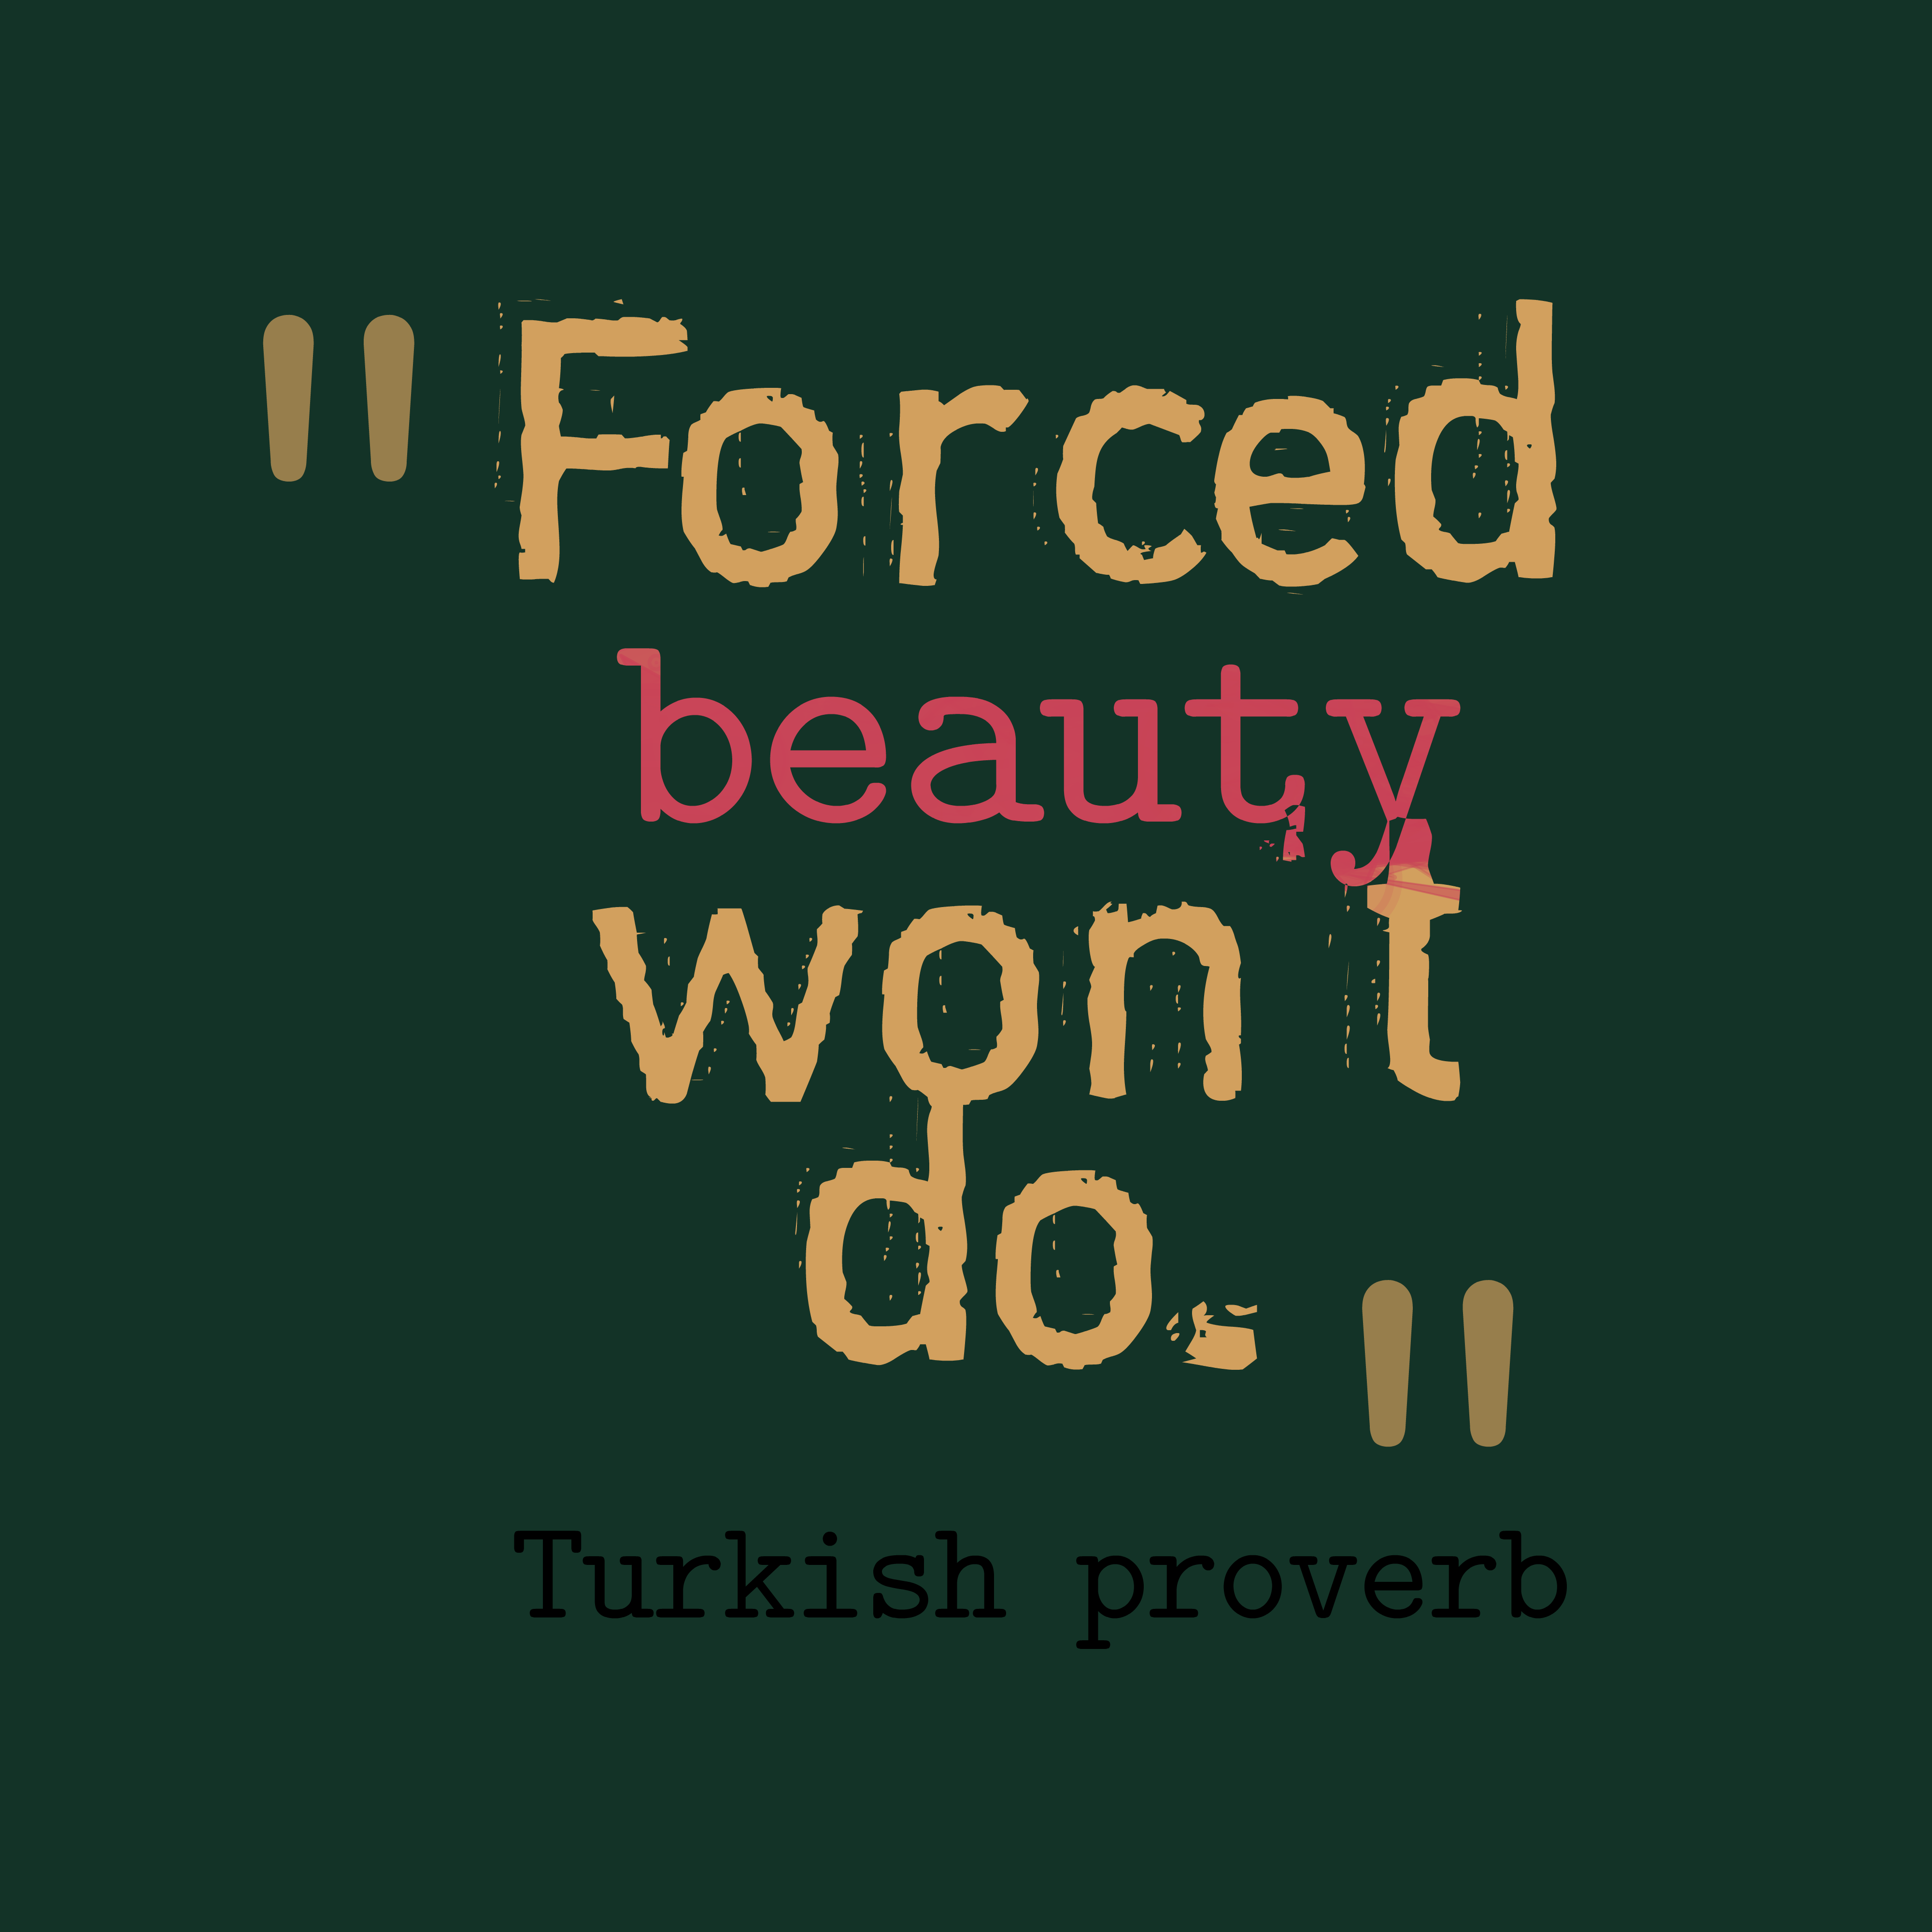 Turkish Wisdom About Beauty